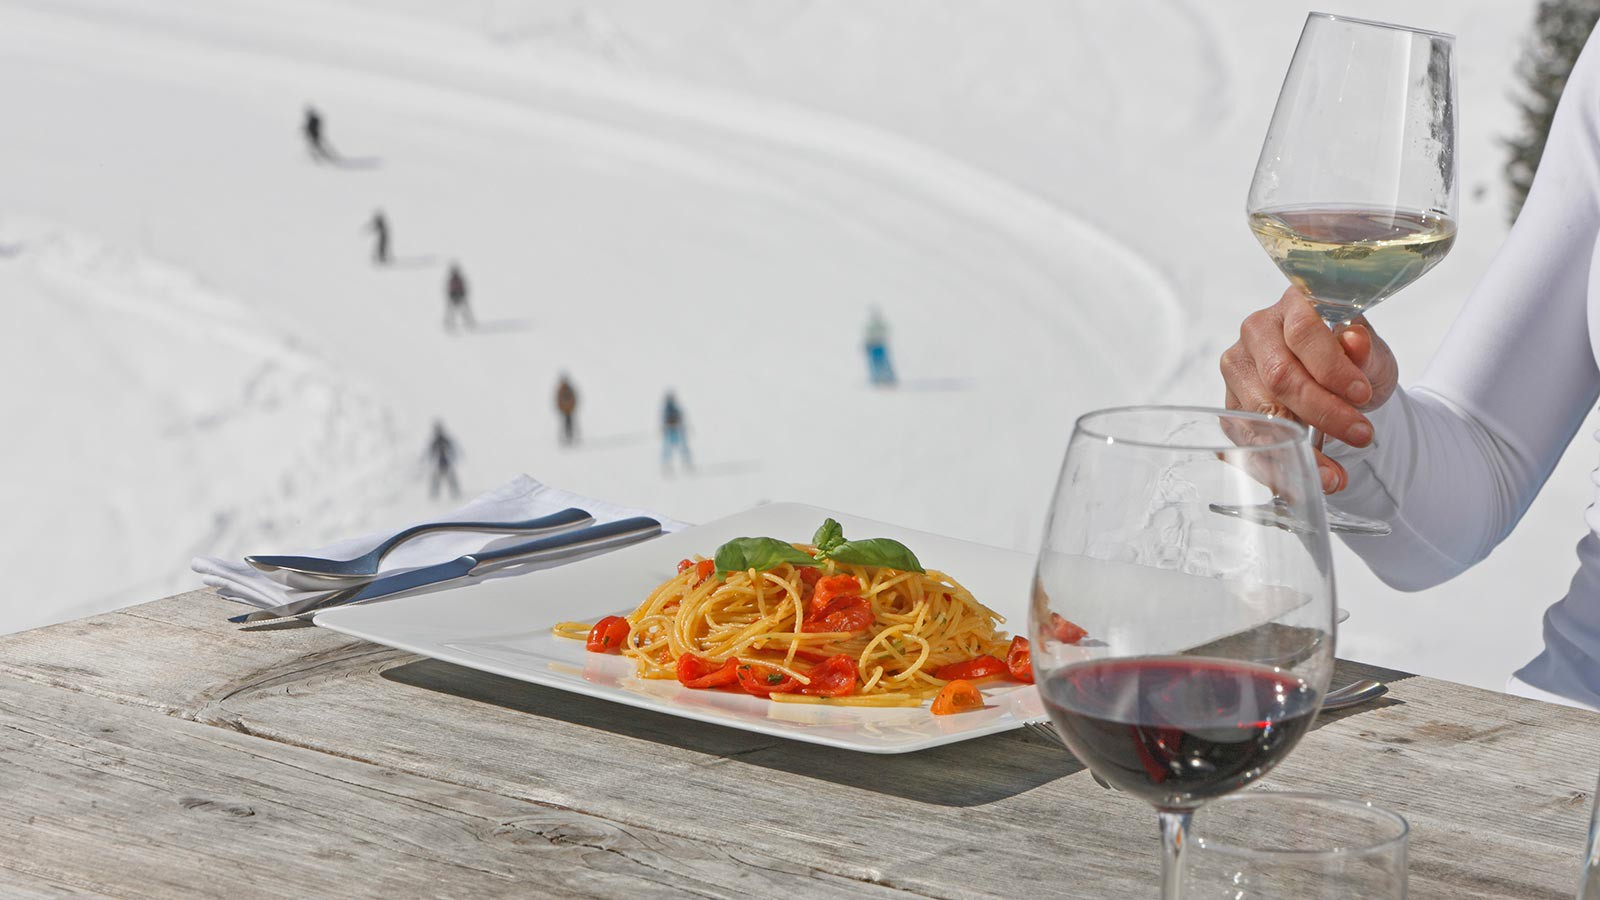 Alta Badia Food and Skiing - copyright IDM Südtirol - Frieder Blickle